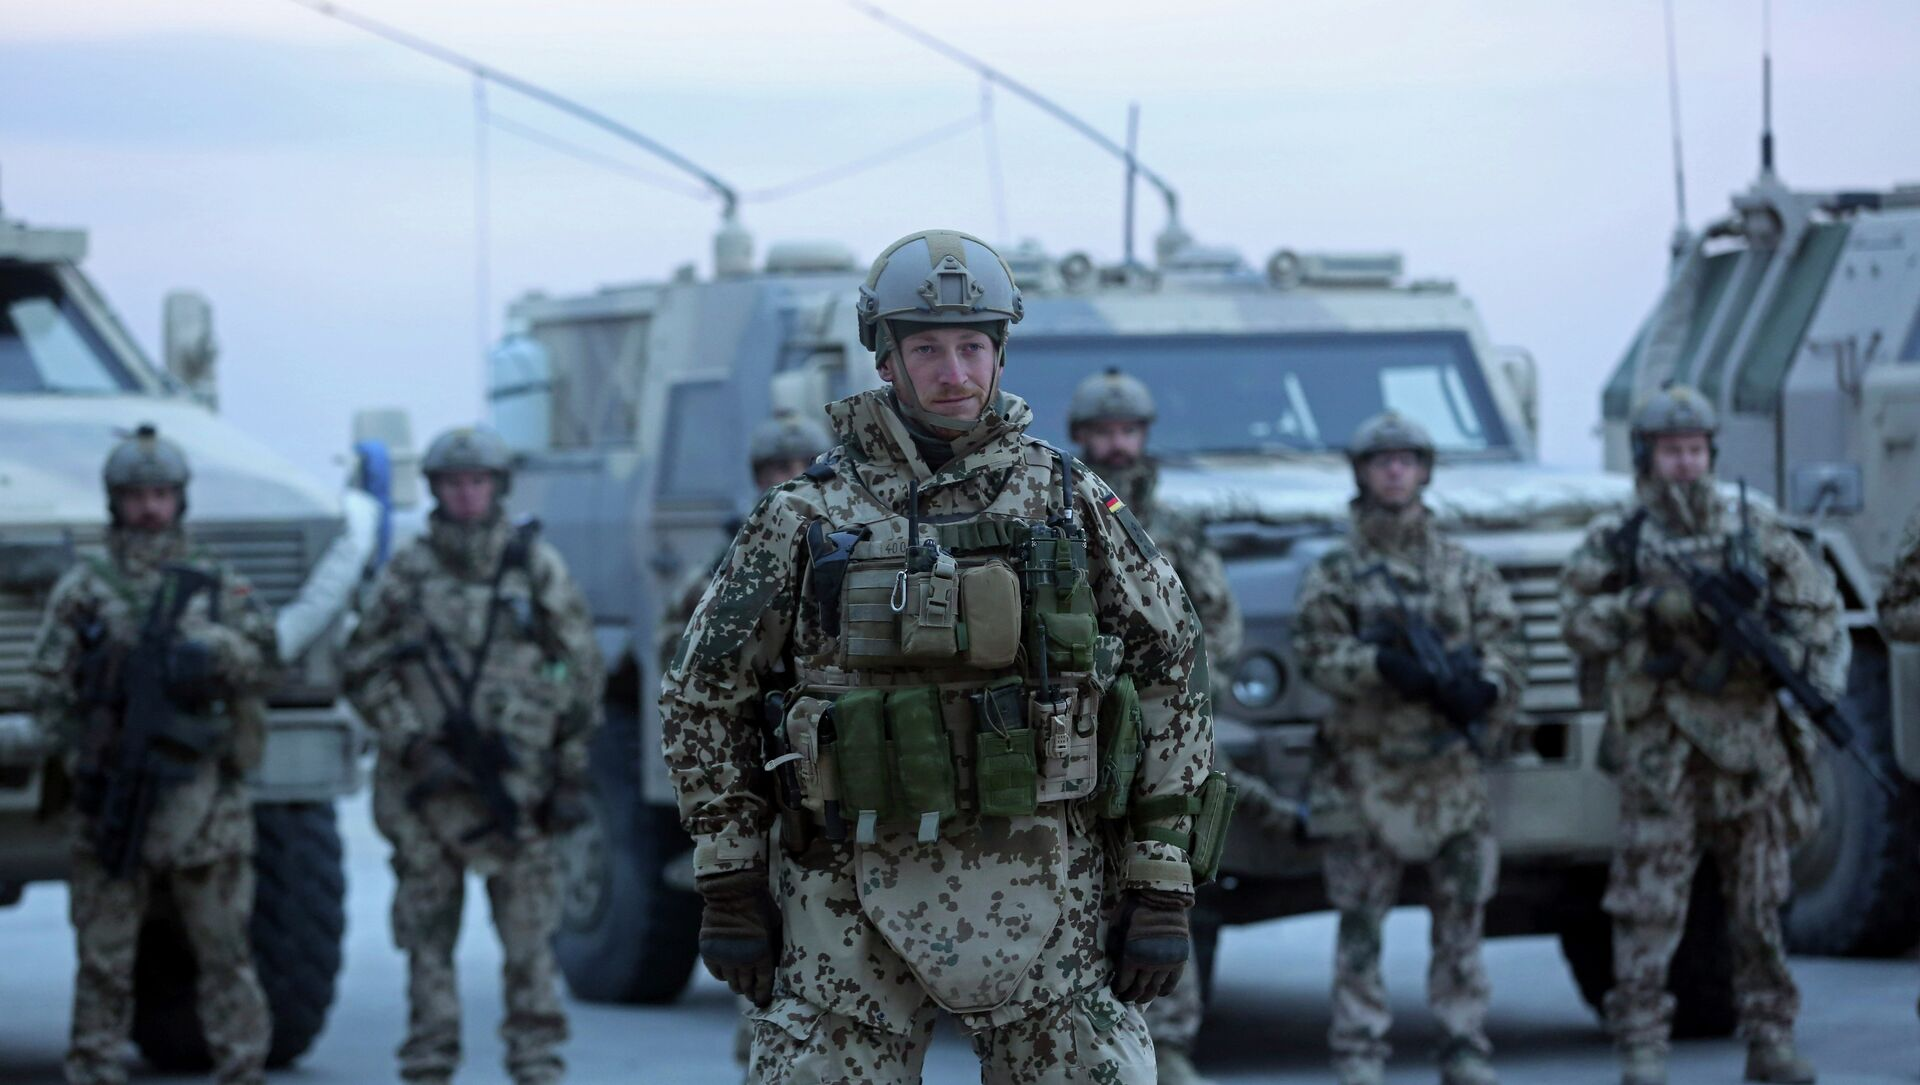 German soldiers stand guard during the NATO Secretary-General Jens Stoltenberg's visit, 2014. - Sputnik International, 1920, 29.06.2021